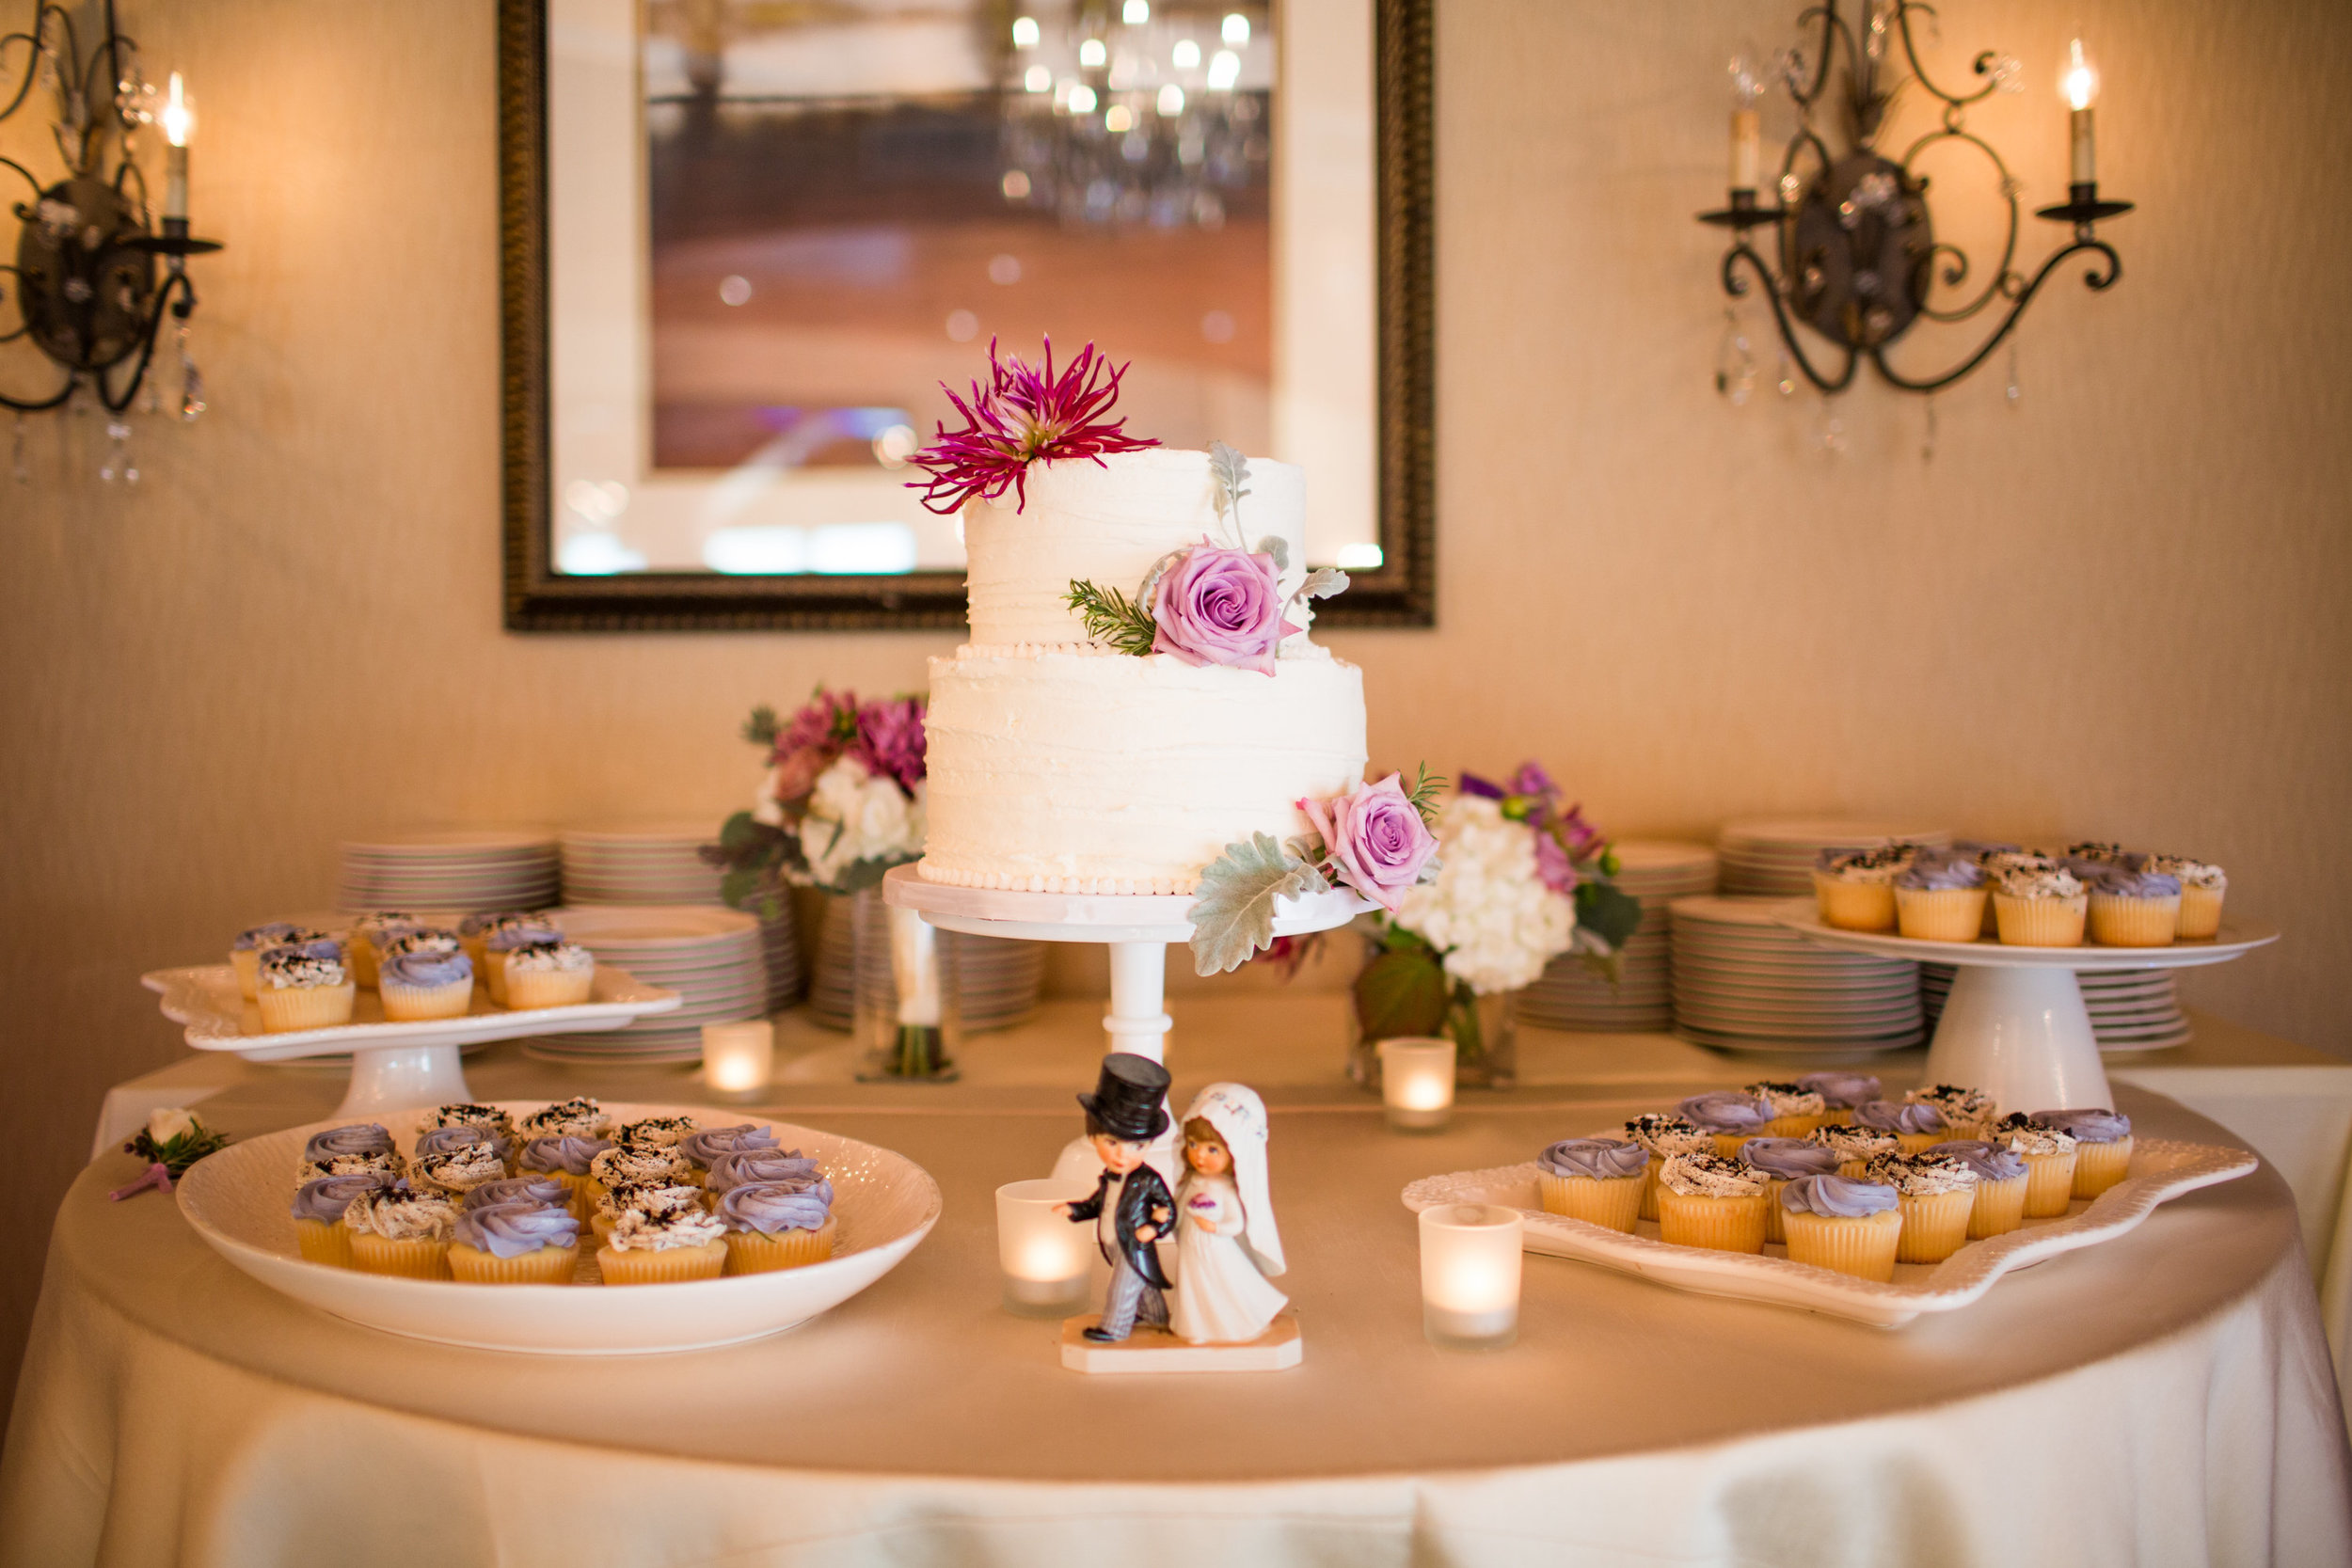 Seattle Wedding Planner, Wedding Wise | Ciccarelli Photography | Edgewater Hotel Wedding | Waterfront wedding | White cake with purple flowers